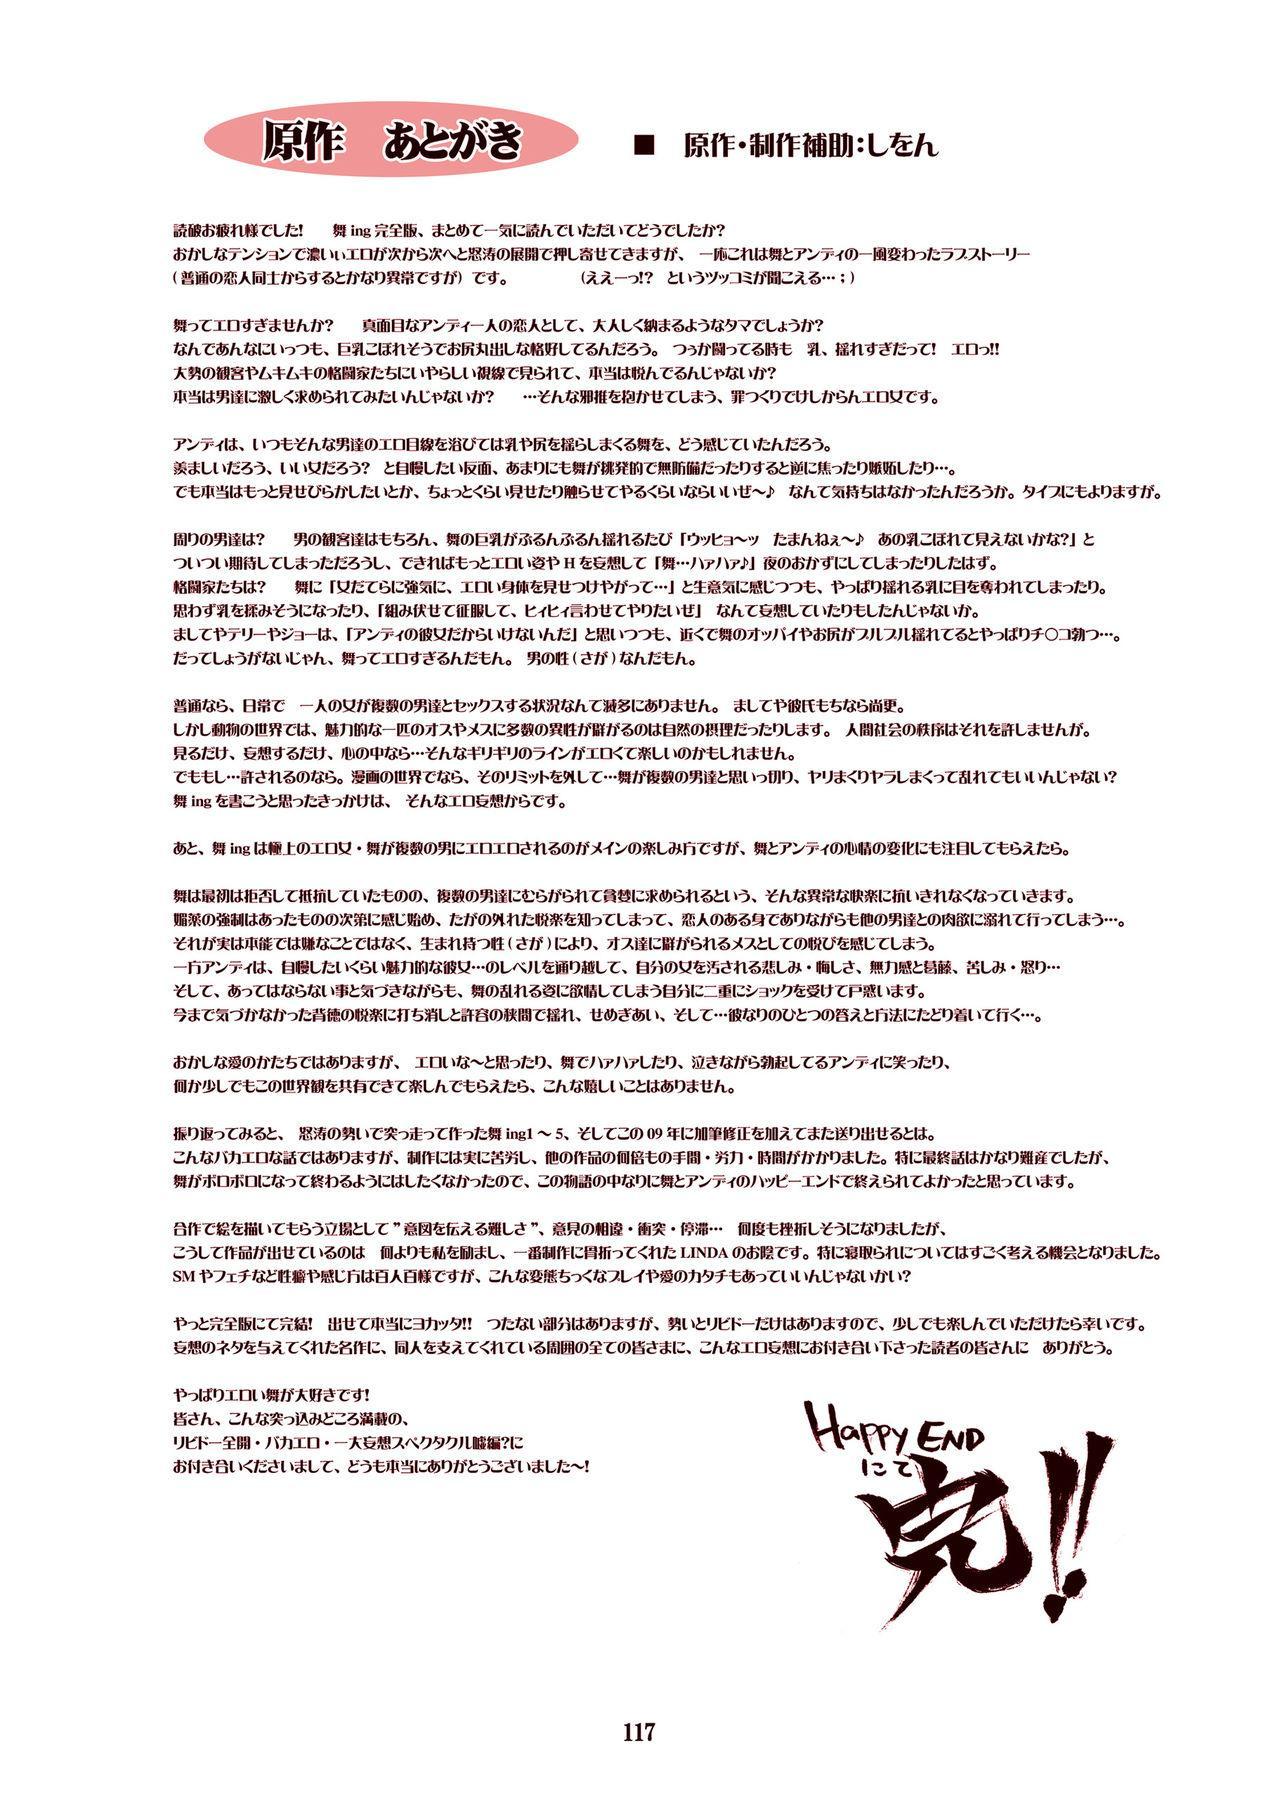 [LINDA]「舞ing(まいっちんぐ)完全版」サンプル●不知火舞 114